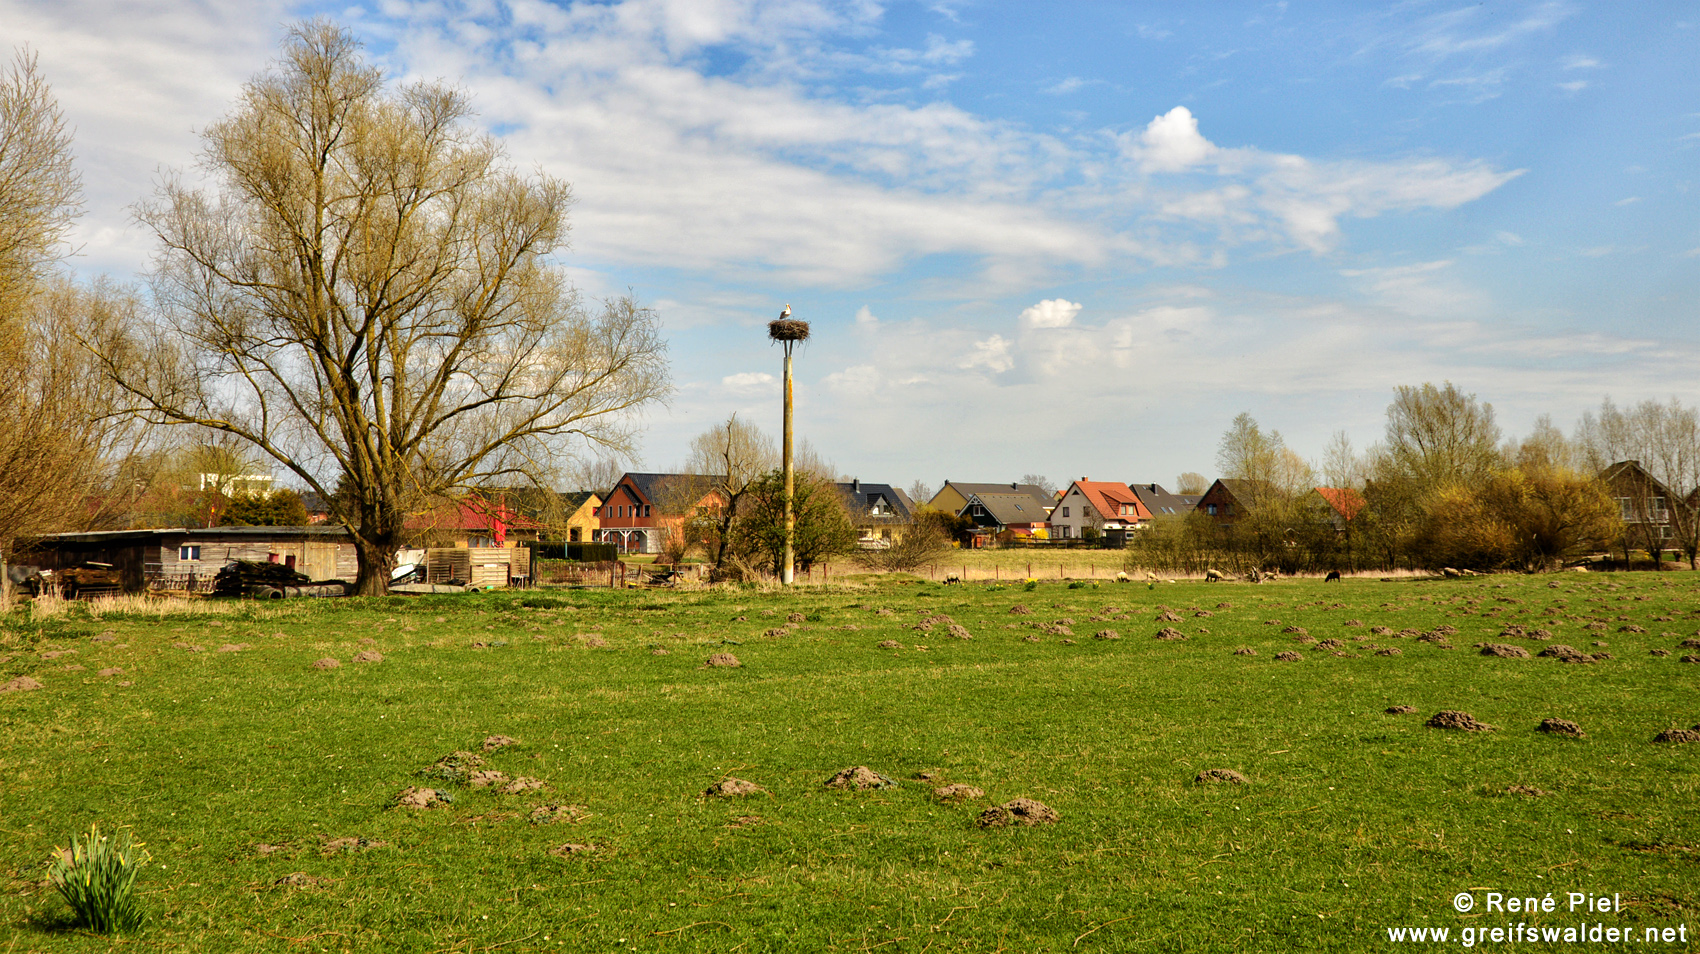 Storch in Greifswald-Eldena